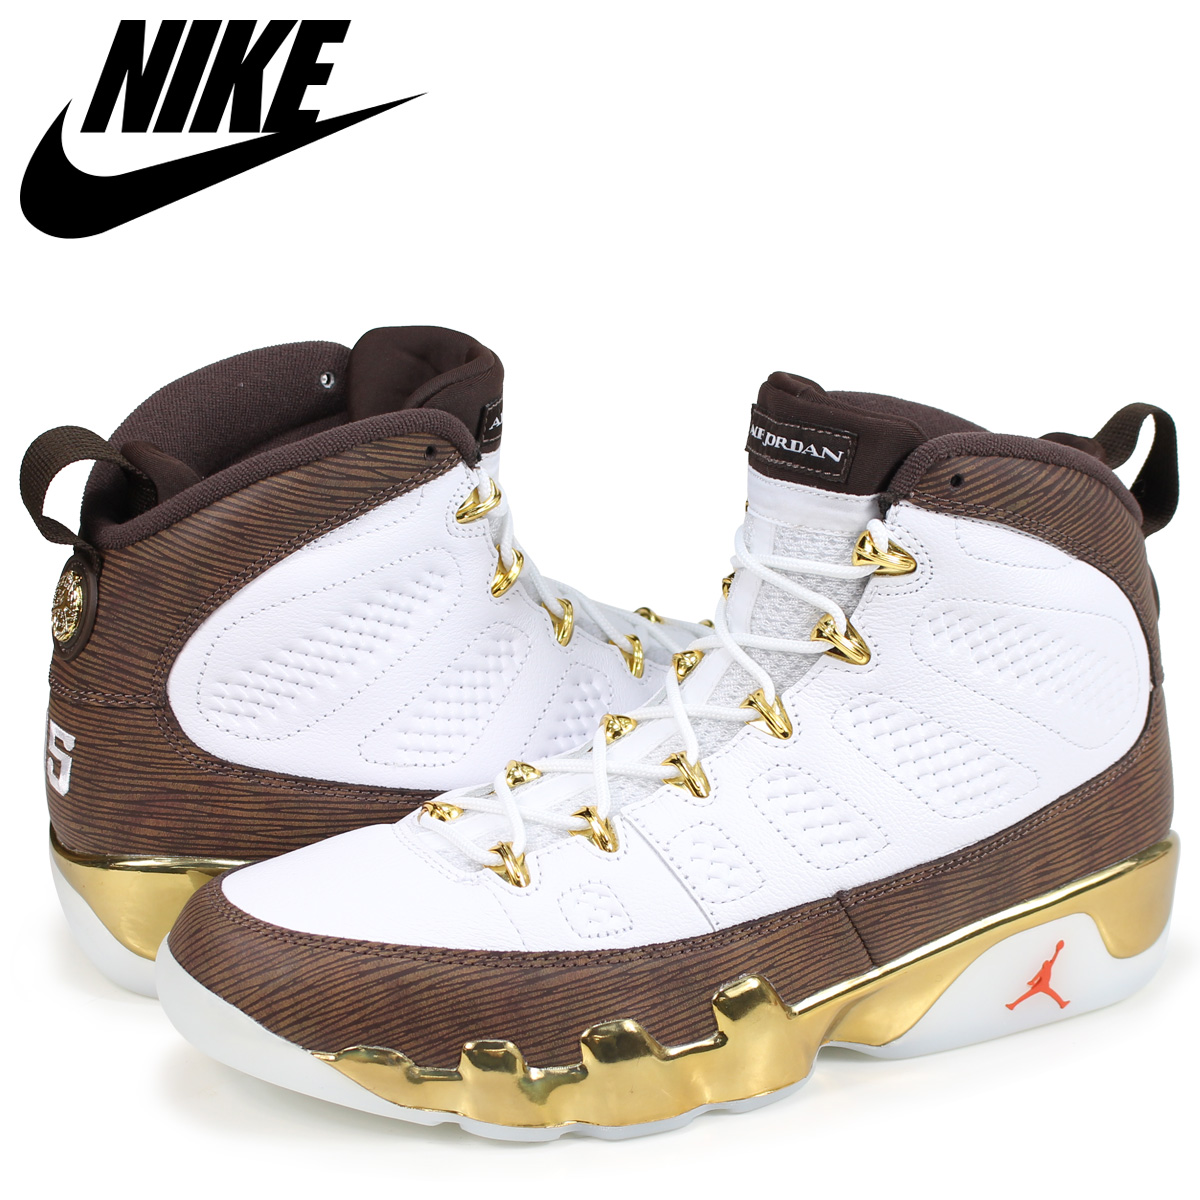 3160504a6550 NIKE Nike Air Jordan 9 nostalgic sneakers men AIR JORDAN 9 RETRO MOP MELO  302